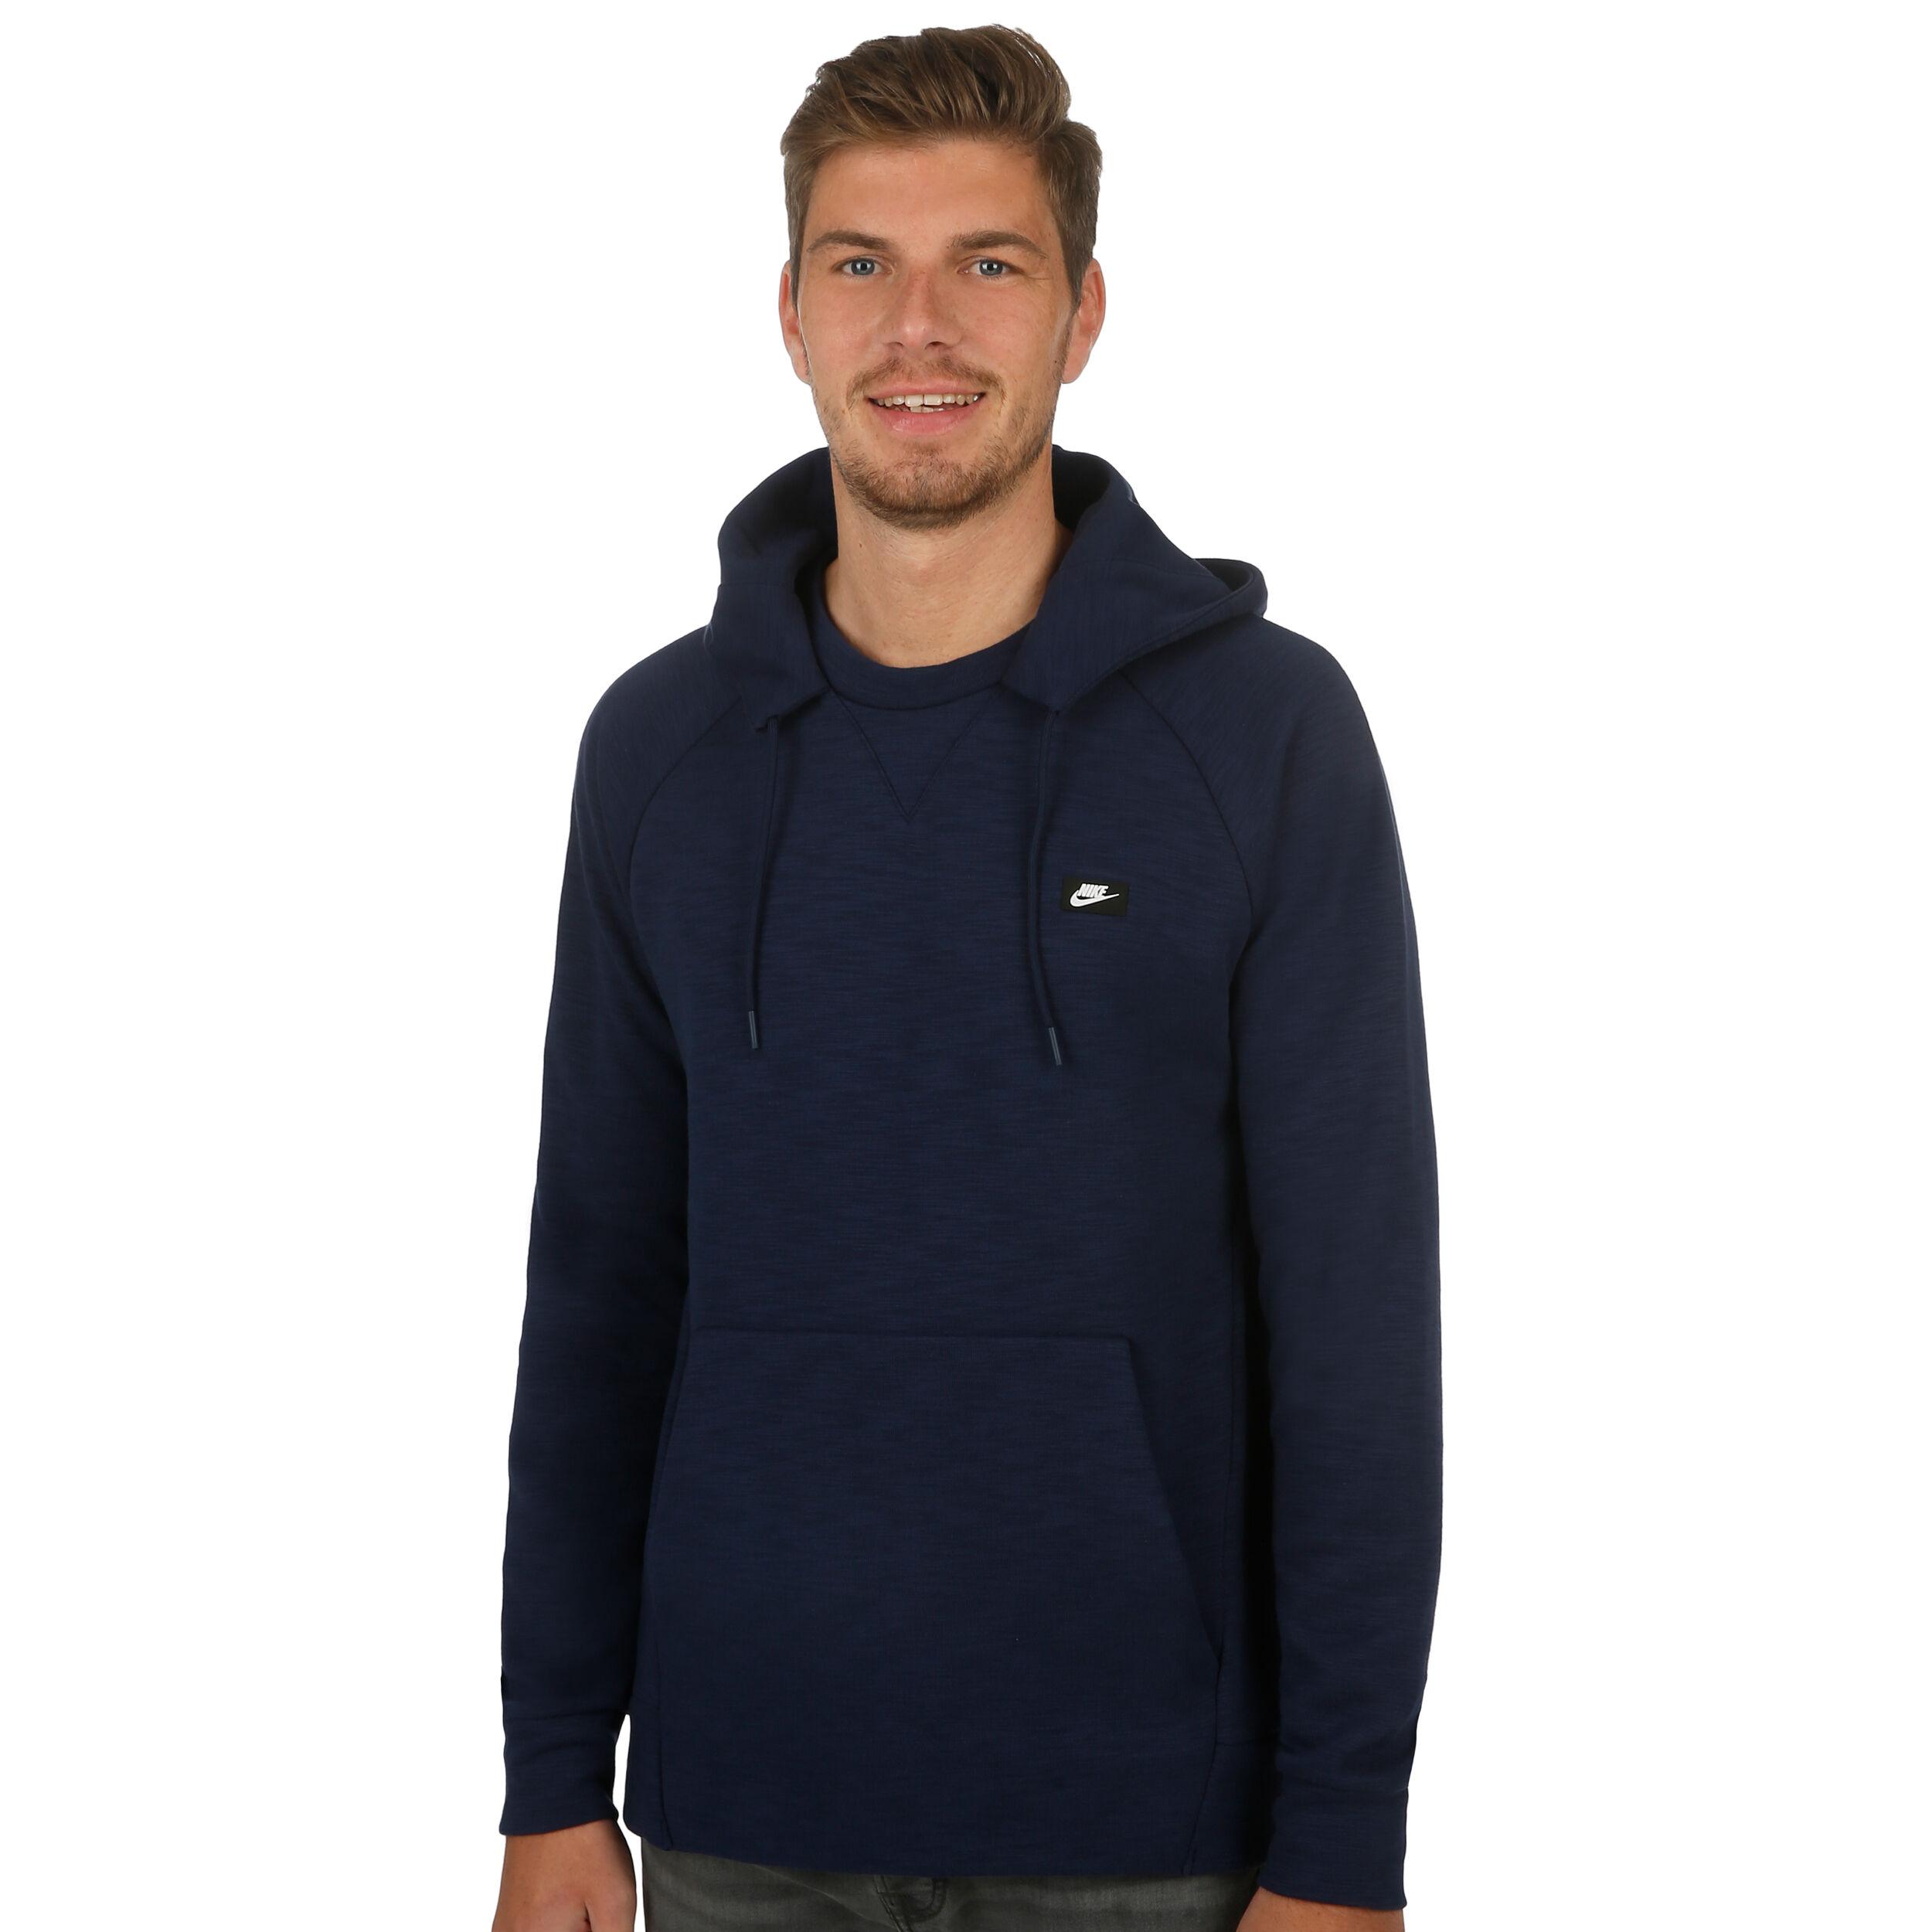 Acquista Optic Fleece hoodie uomo Nike Sportswear in nero